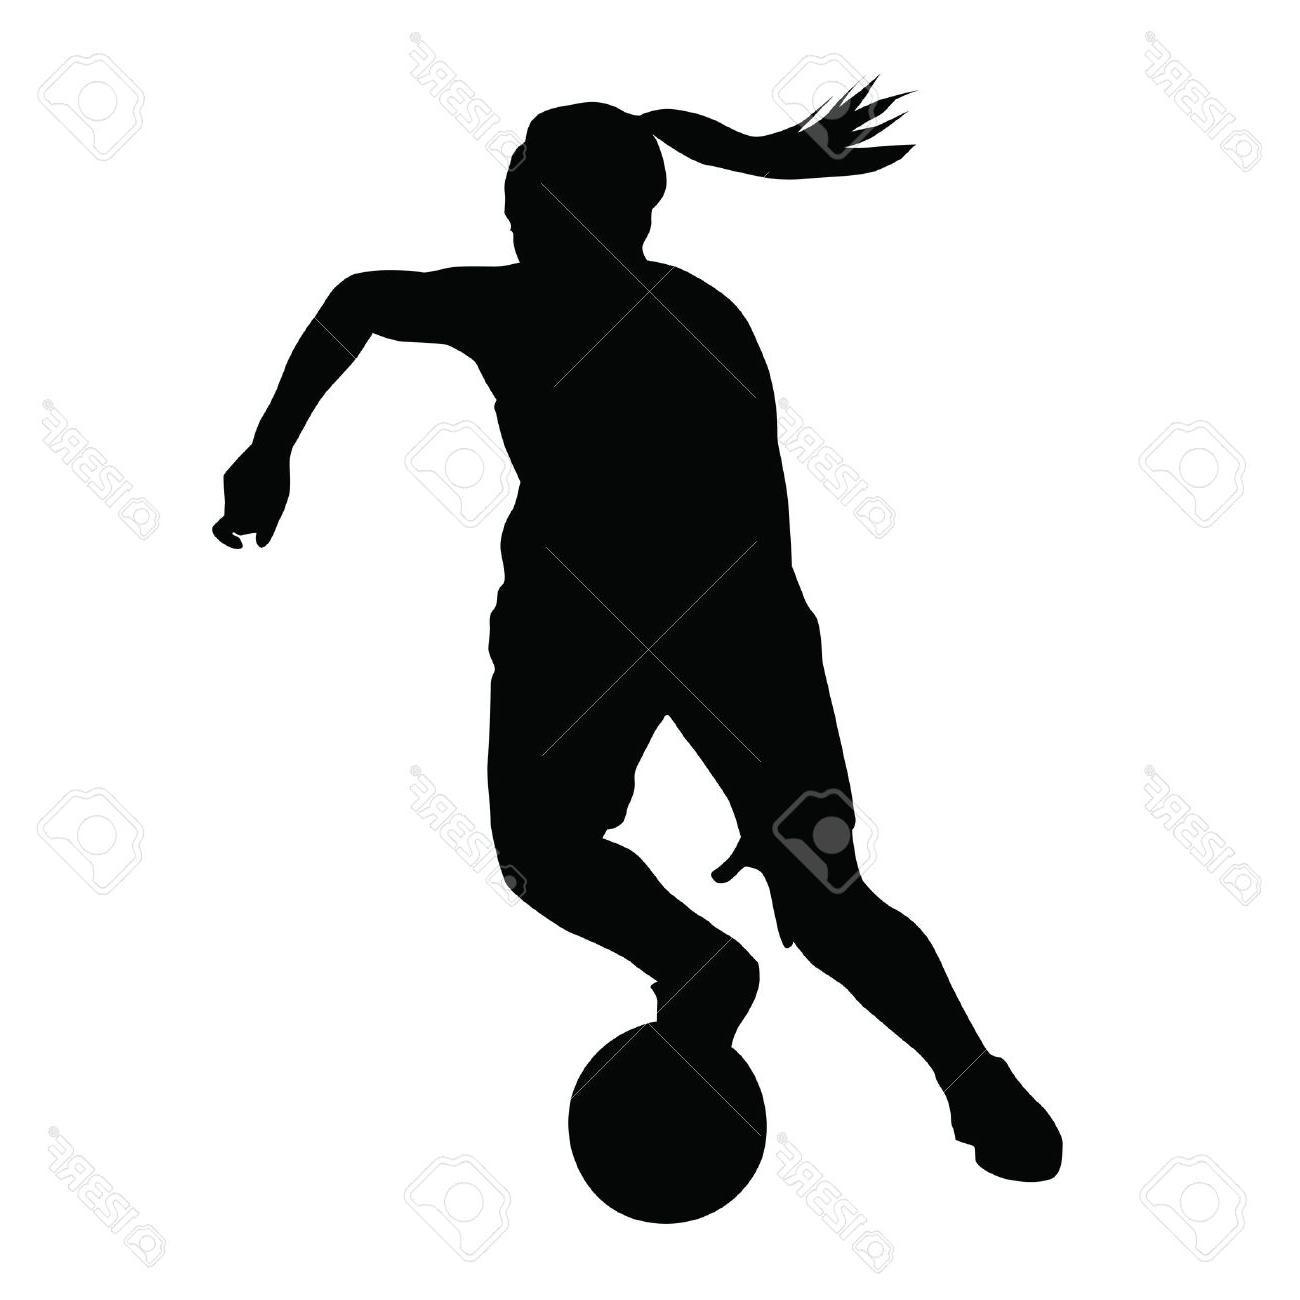 1300x1300 Best 15 Basketball Player Vector Silhouette Woman Girl Running